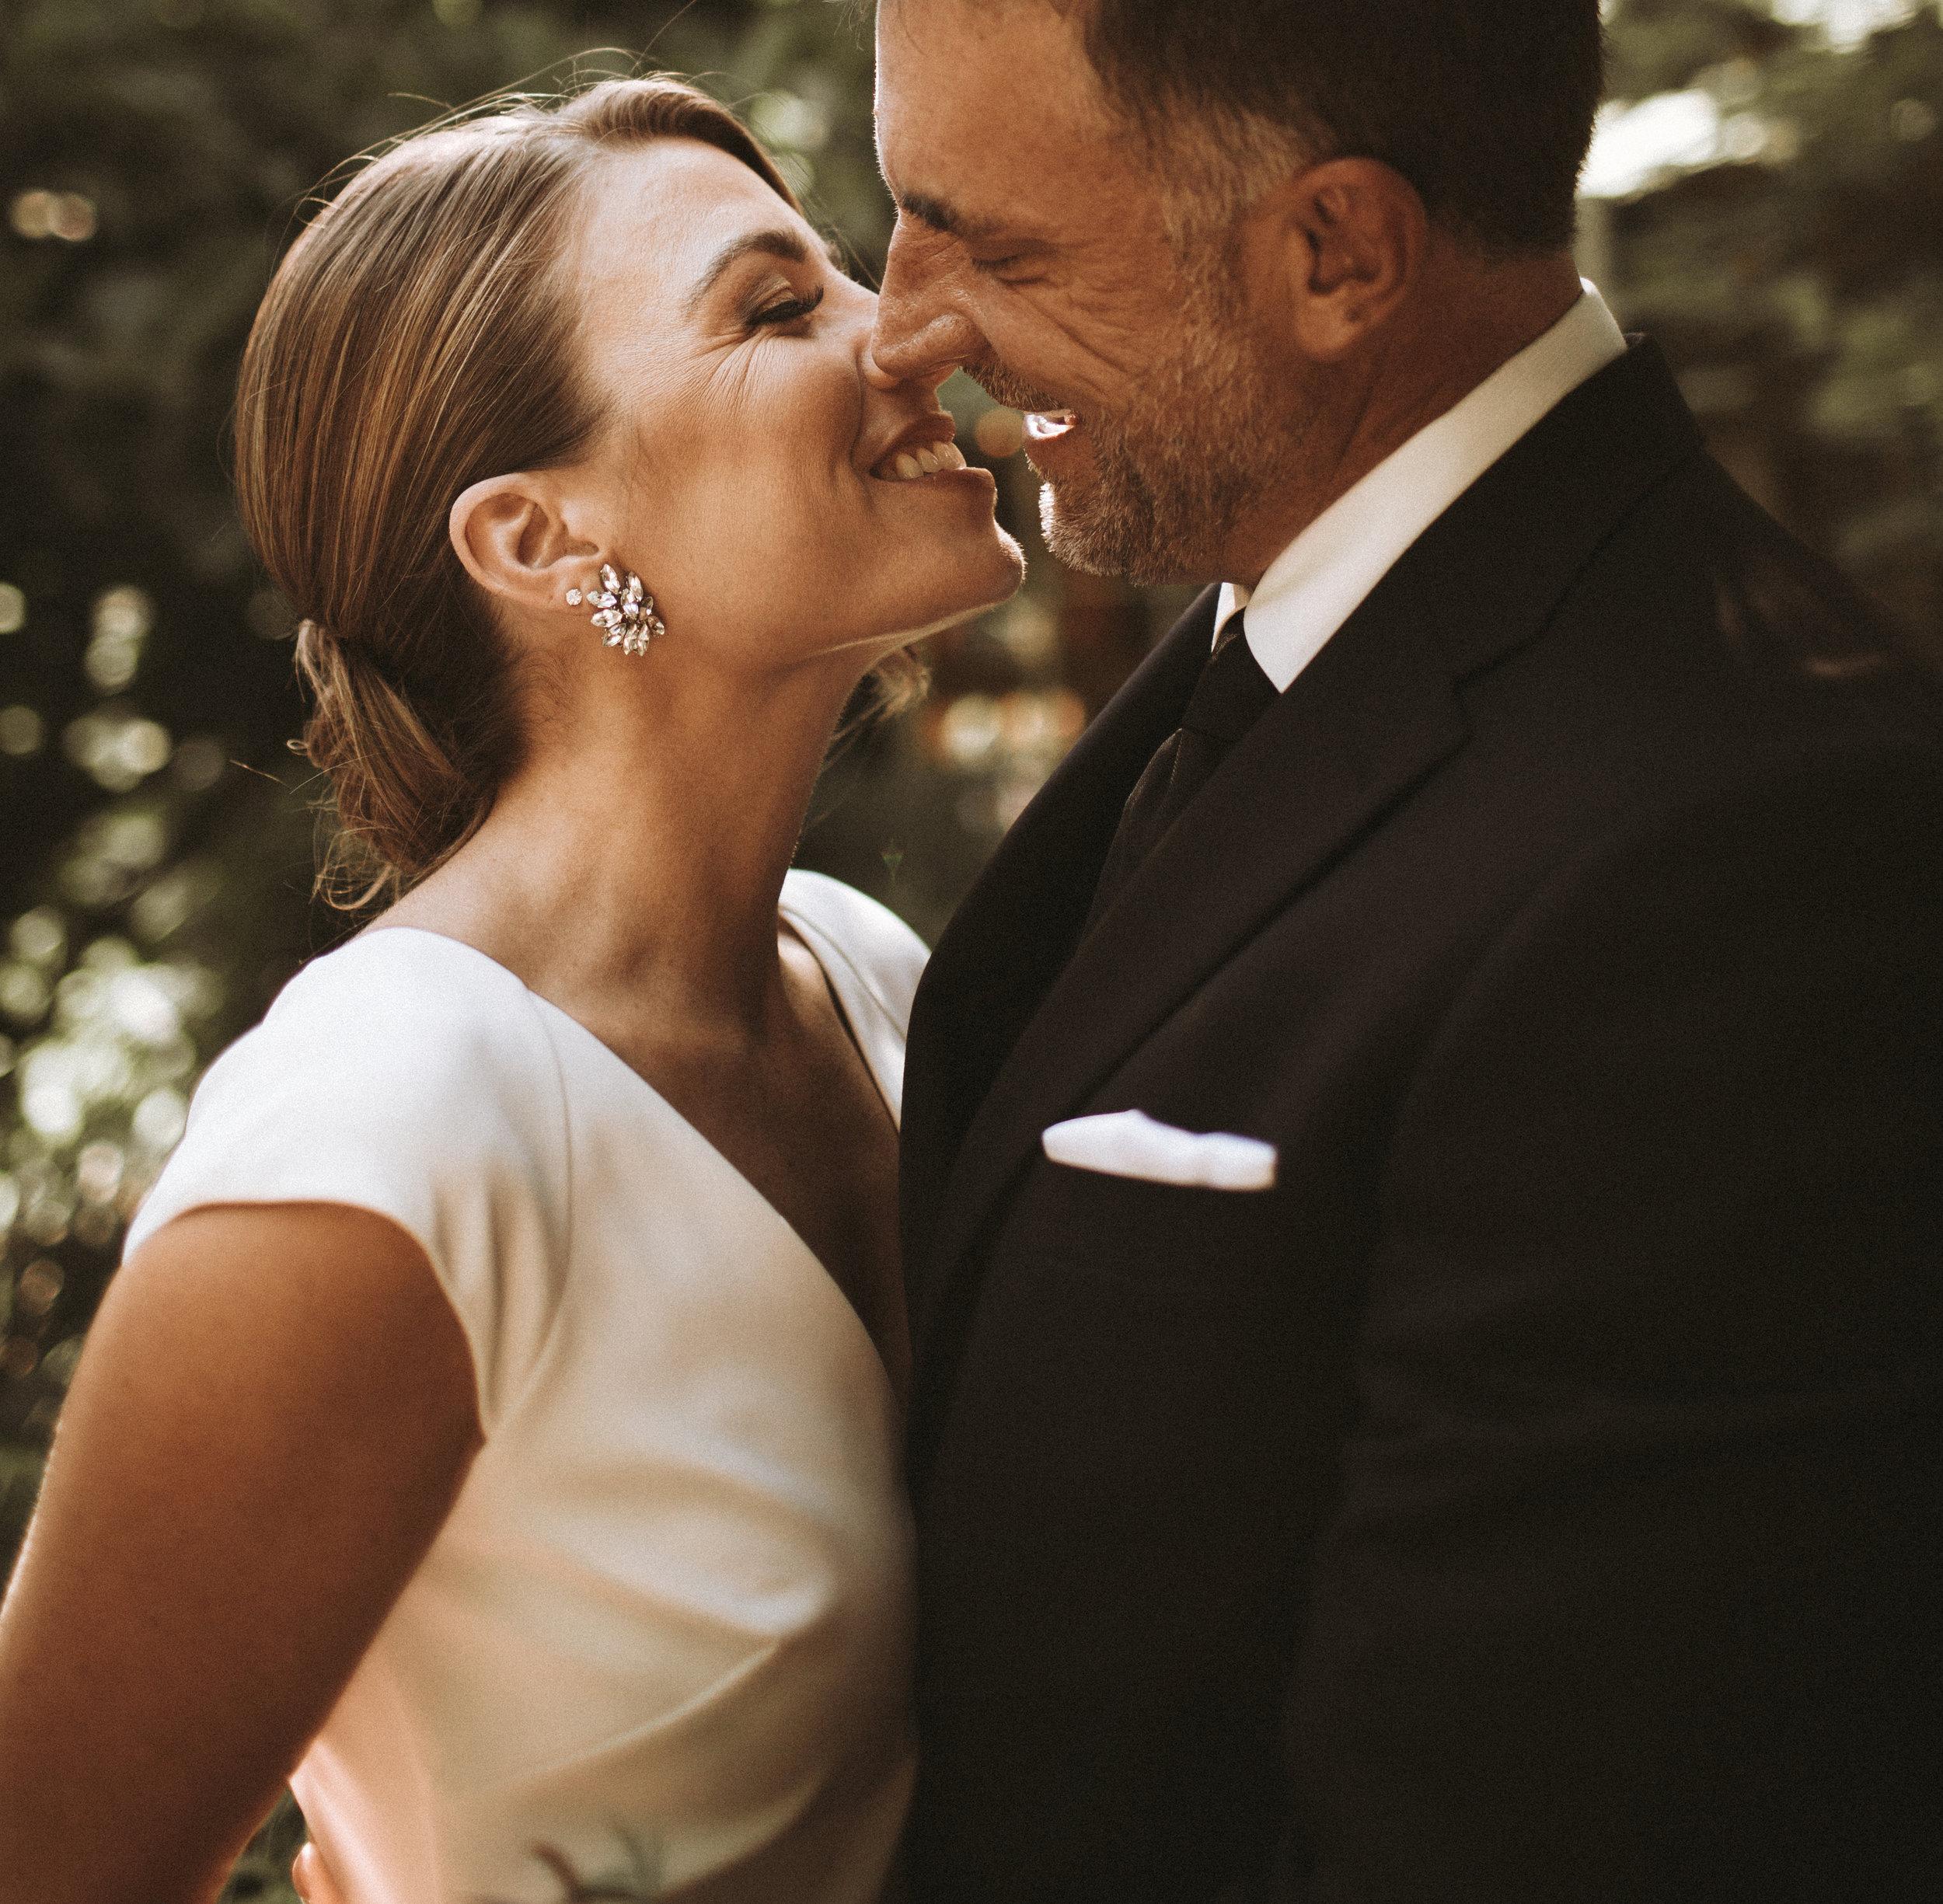 PORTLAND INTIMATE BACKYARD WEDDING_JENNY CHOKBENGBOUN PHOTO-188 copy.jpg